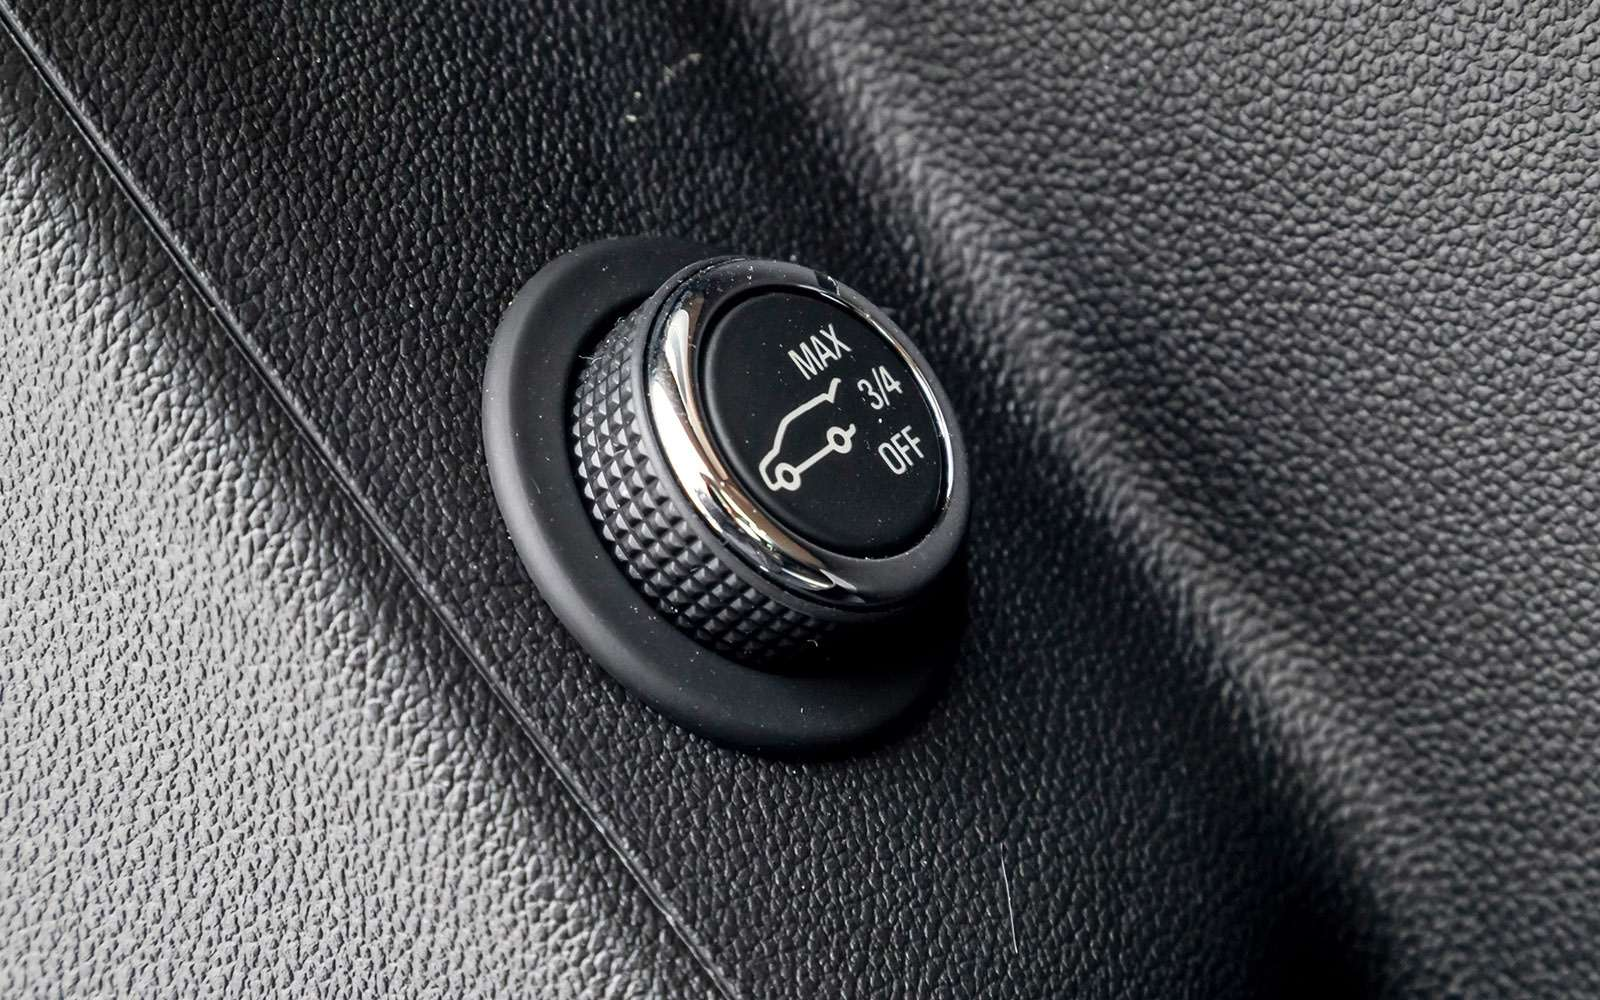 Тест премиум-кроссоверов: Lexus RX350, Cadillac XT5и Jaguar F-Pace— фото 721798